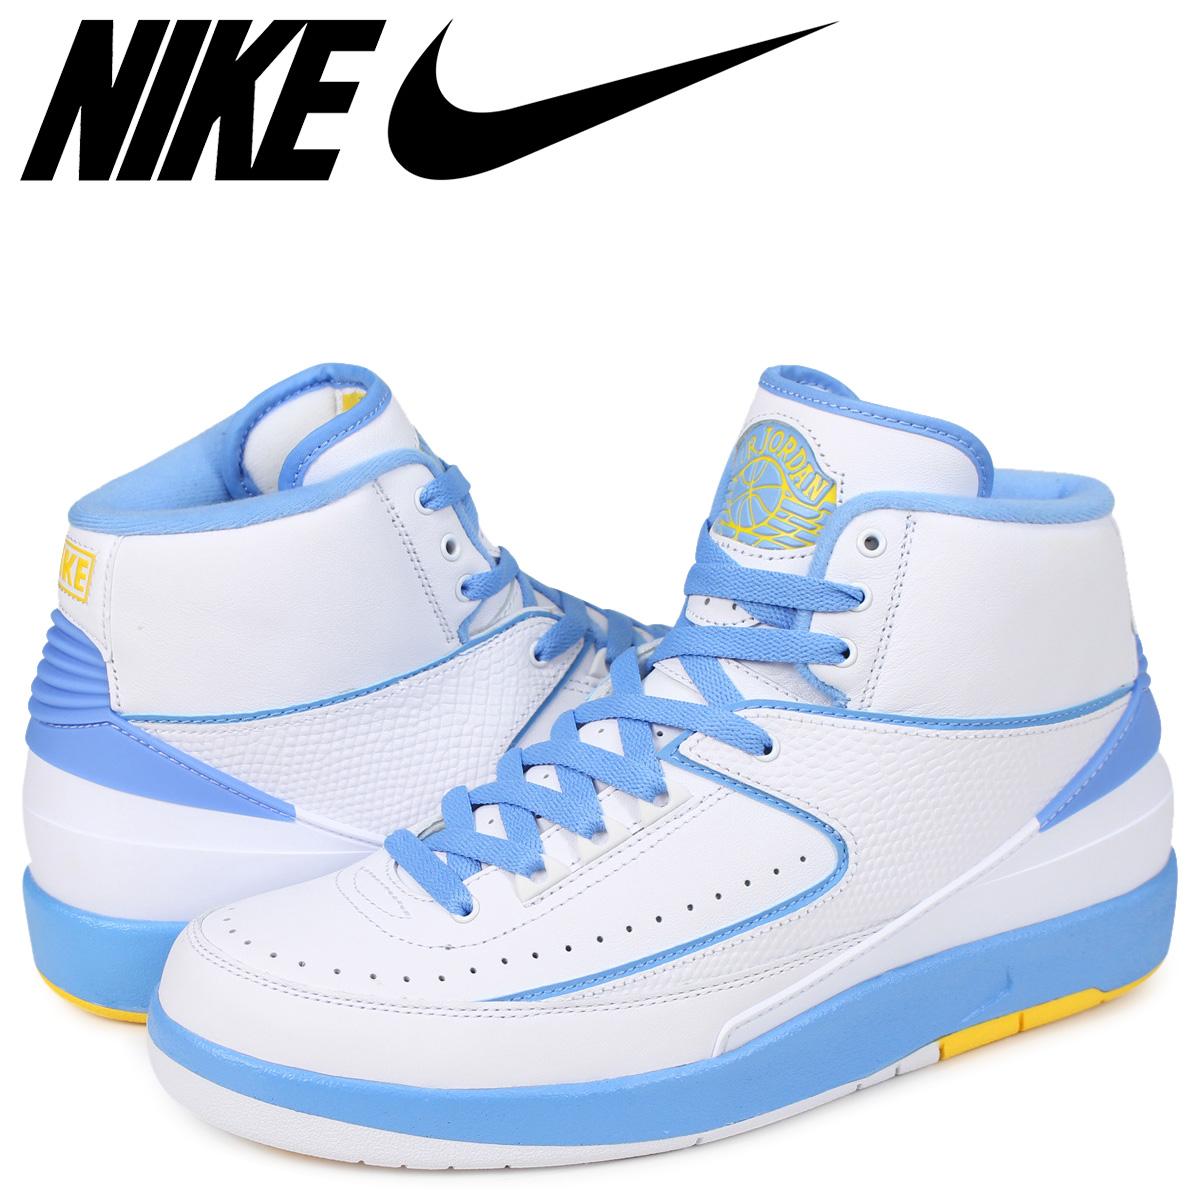 d98e7c84bf3 NIKE AIR JORDAN 2 RETRO MELO Nike Air Jordan 2 nostalgic sneakers men  385,475-122 ...